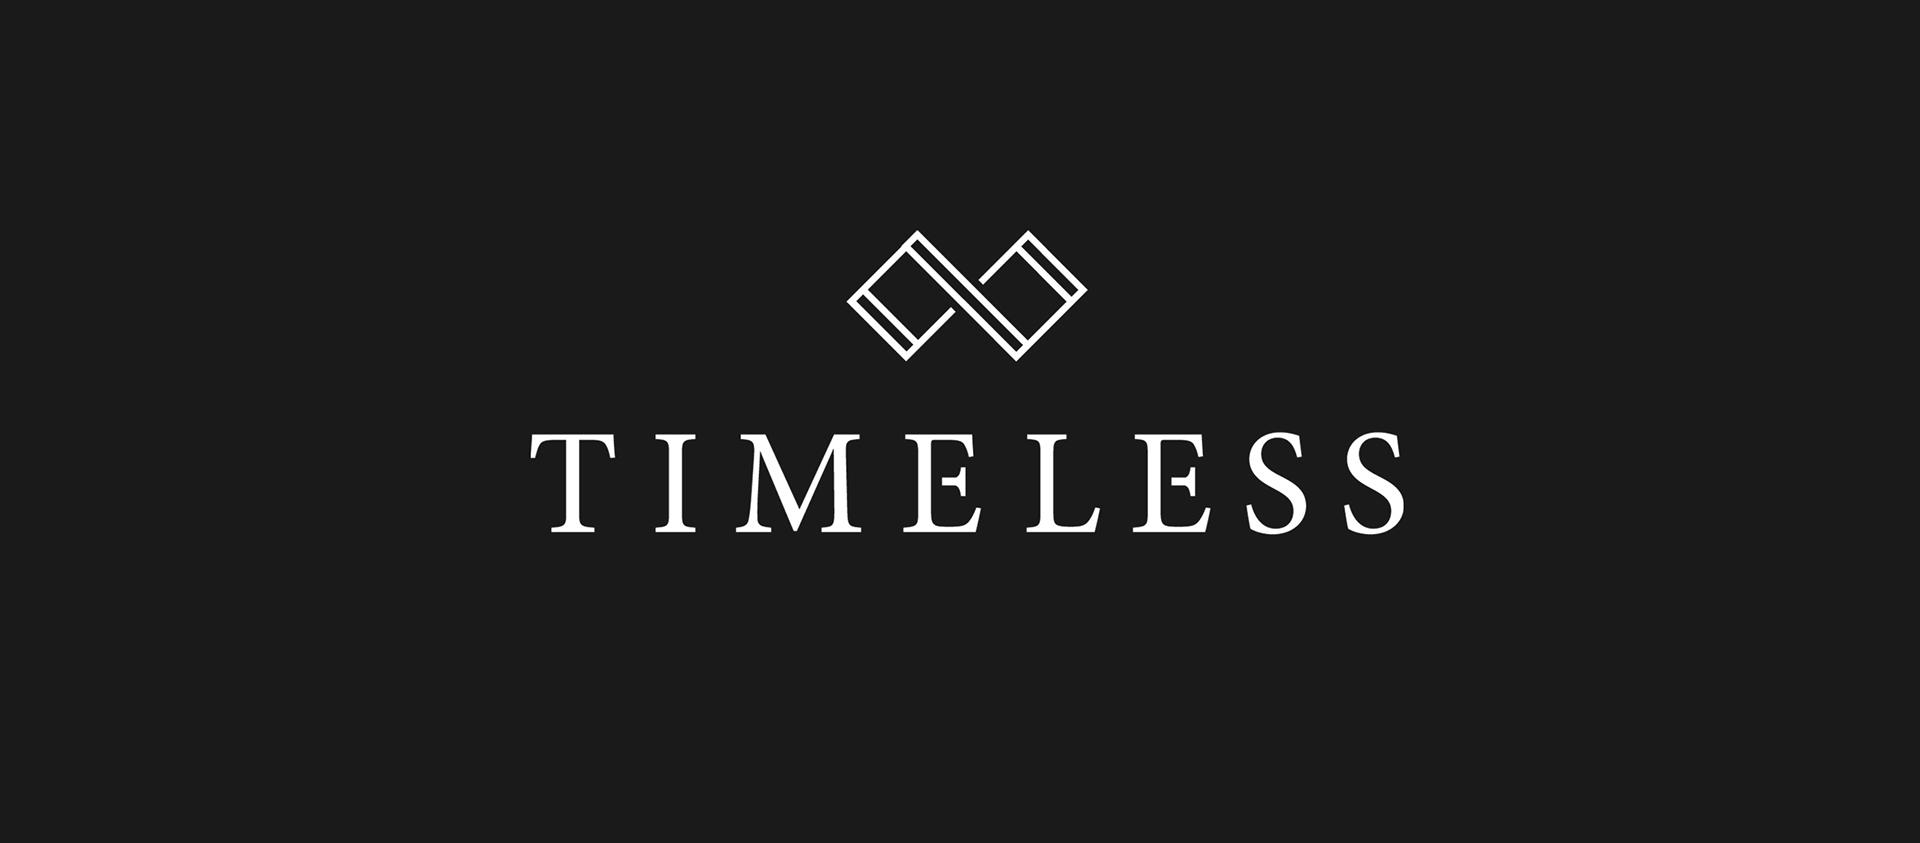 luxury watches logos - HD1920×843